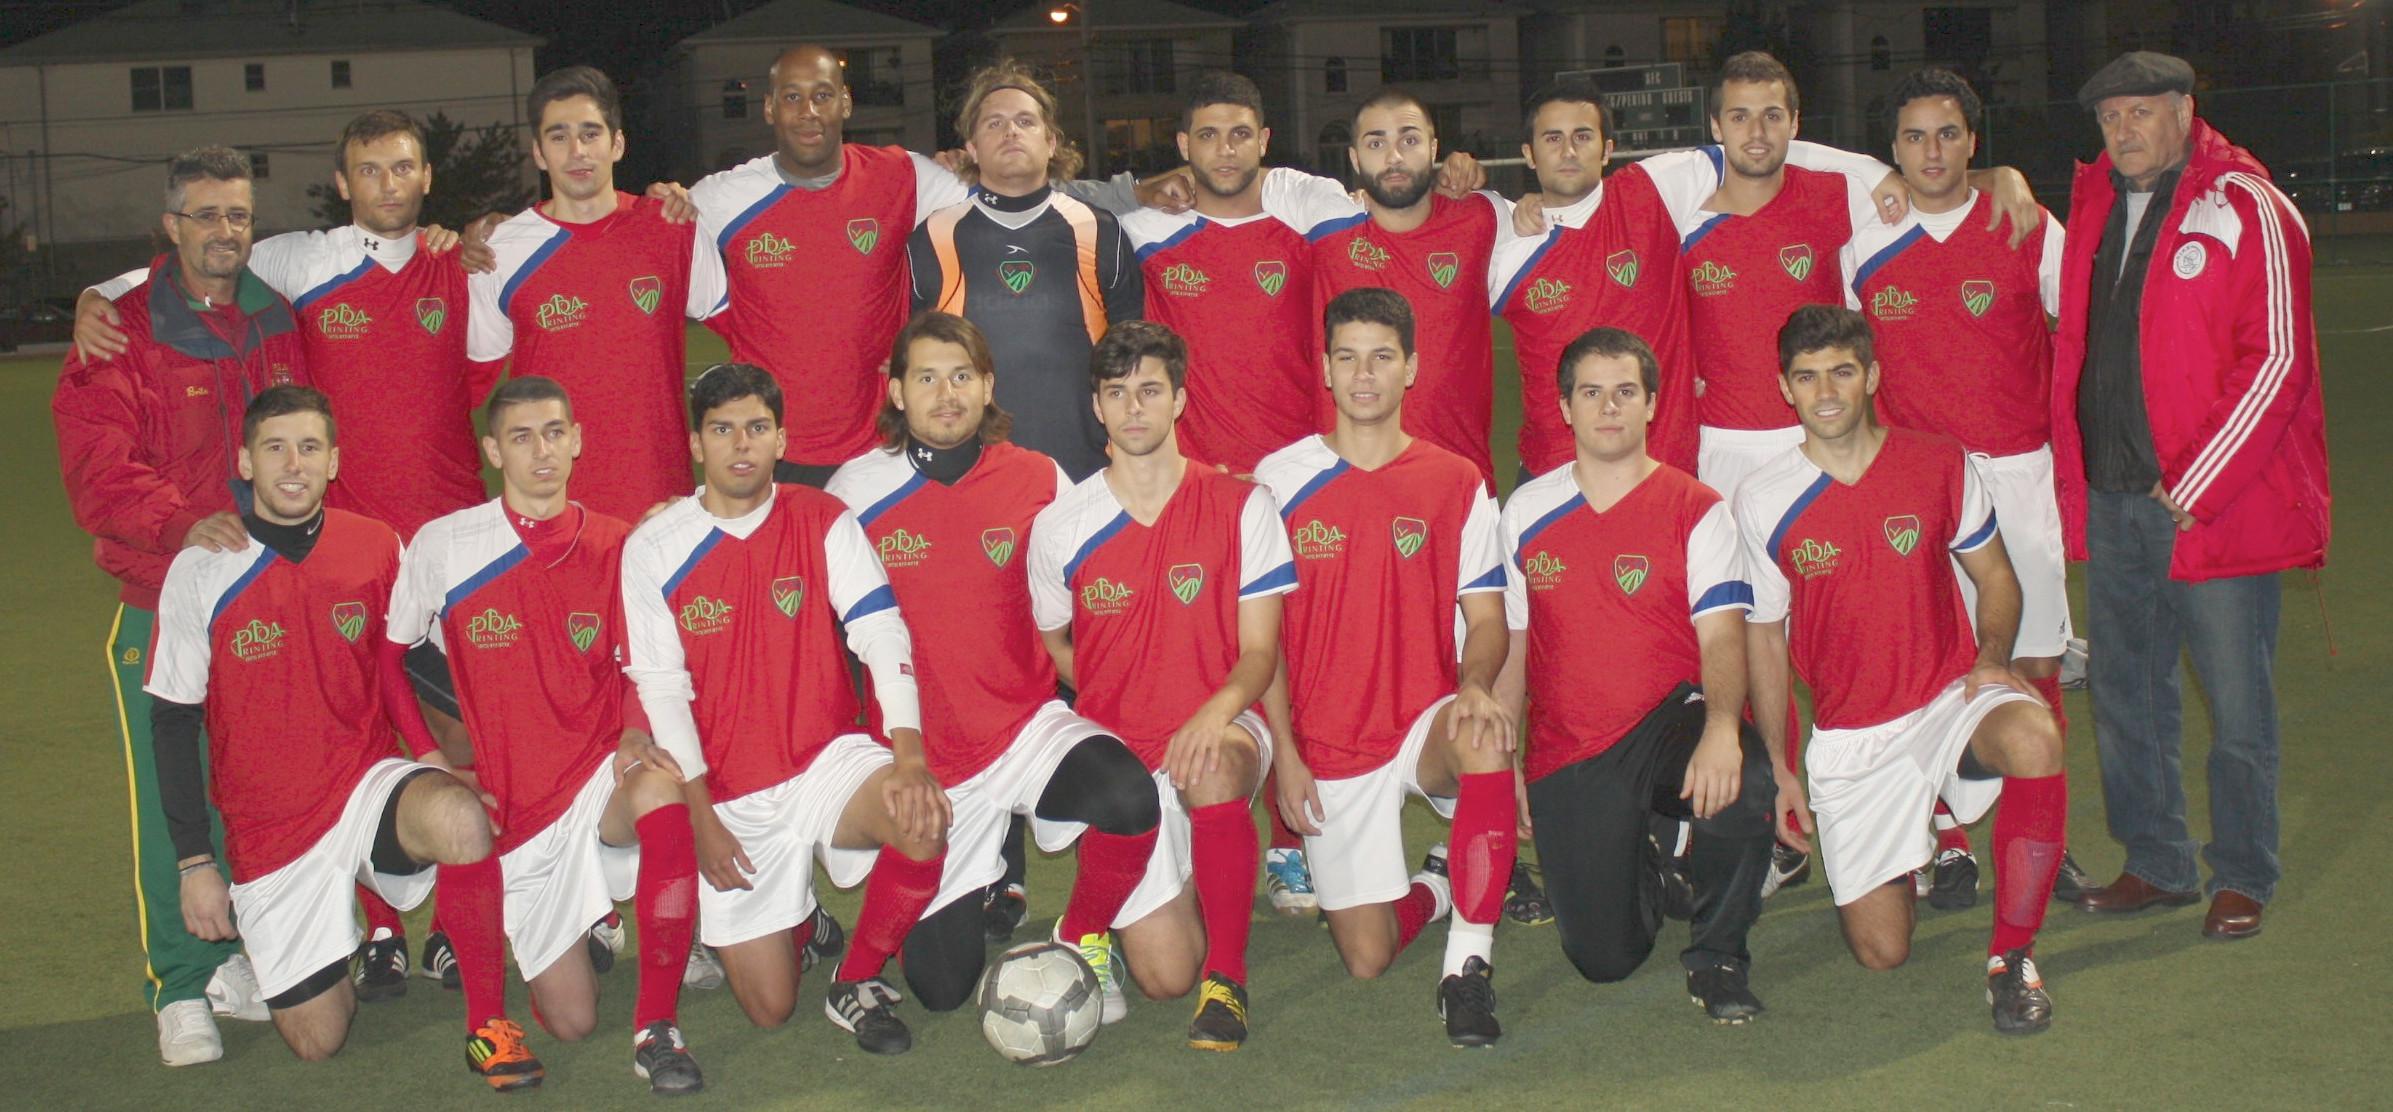 Portuguese Sports Association